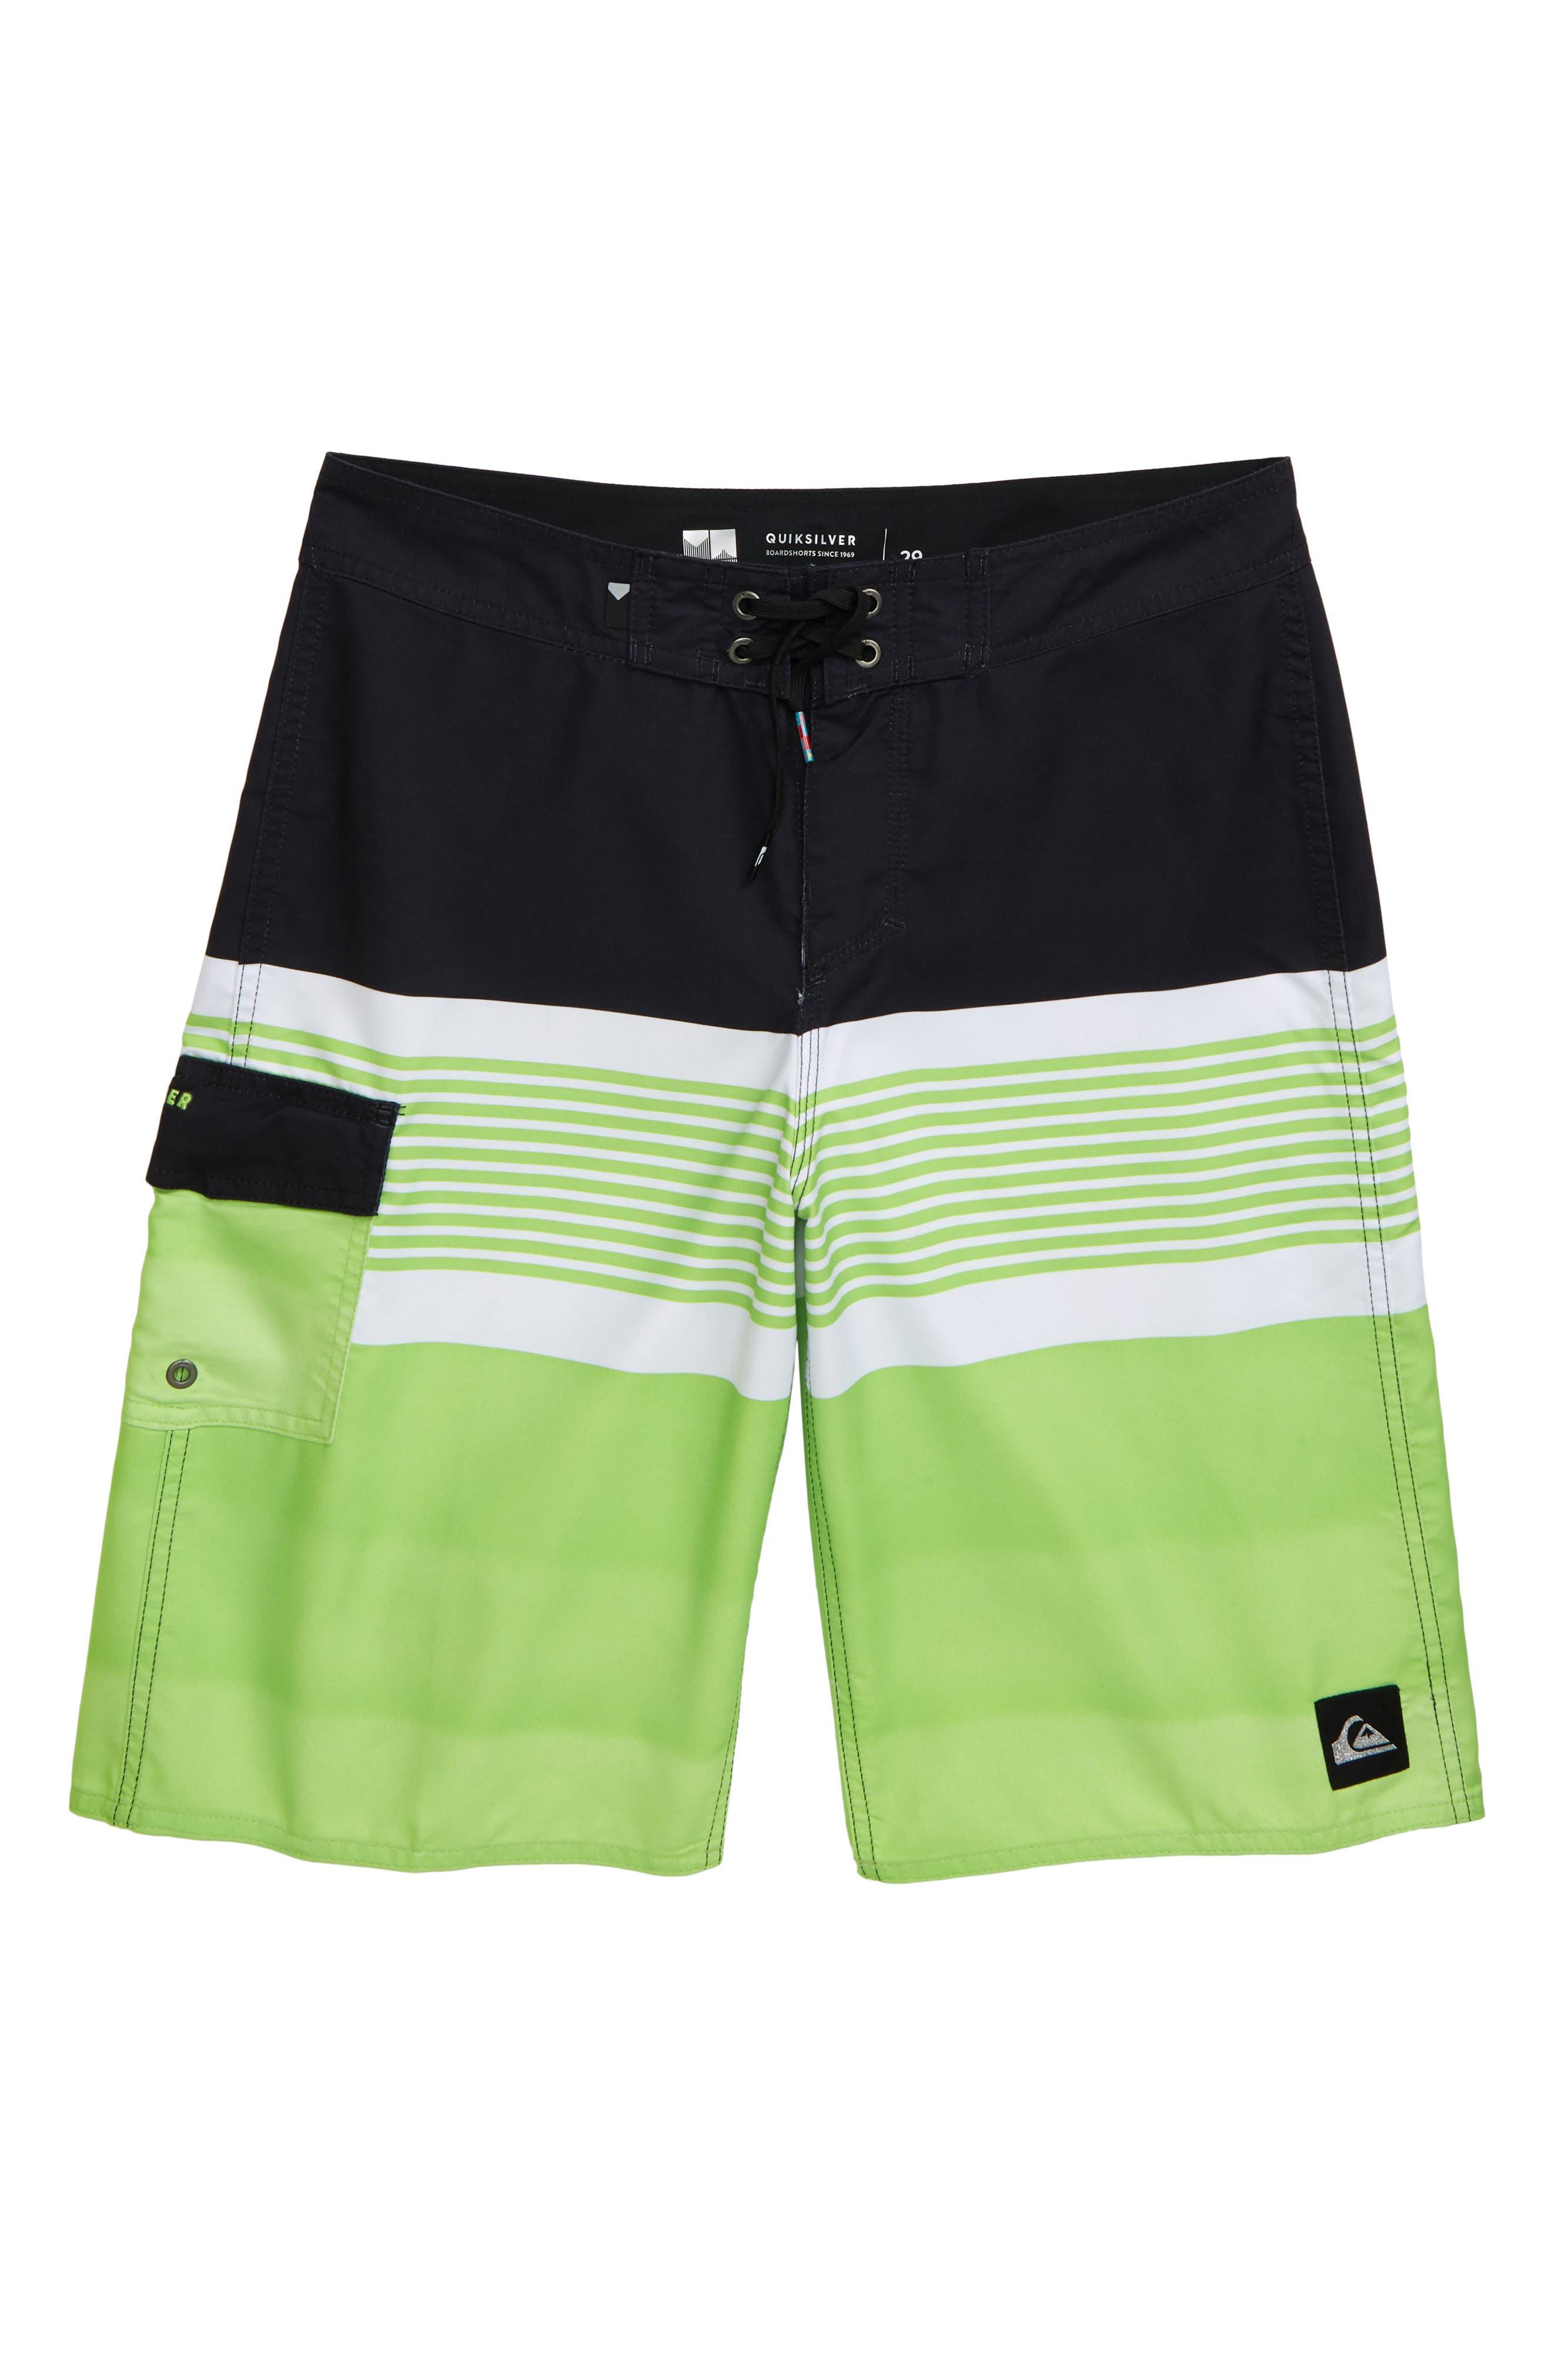 596c3ab235 Quiksilver - Boys' Swimwear and Beachwear